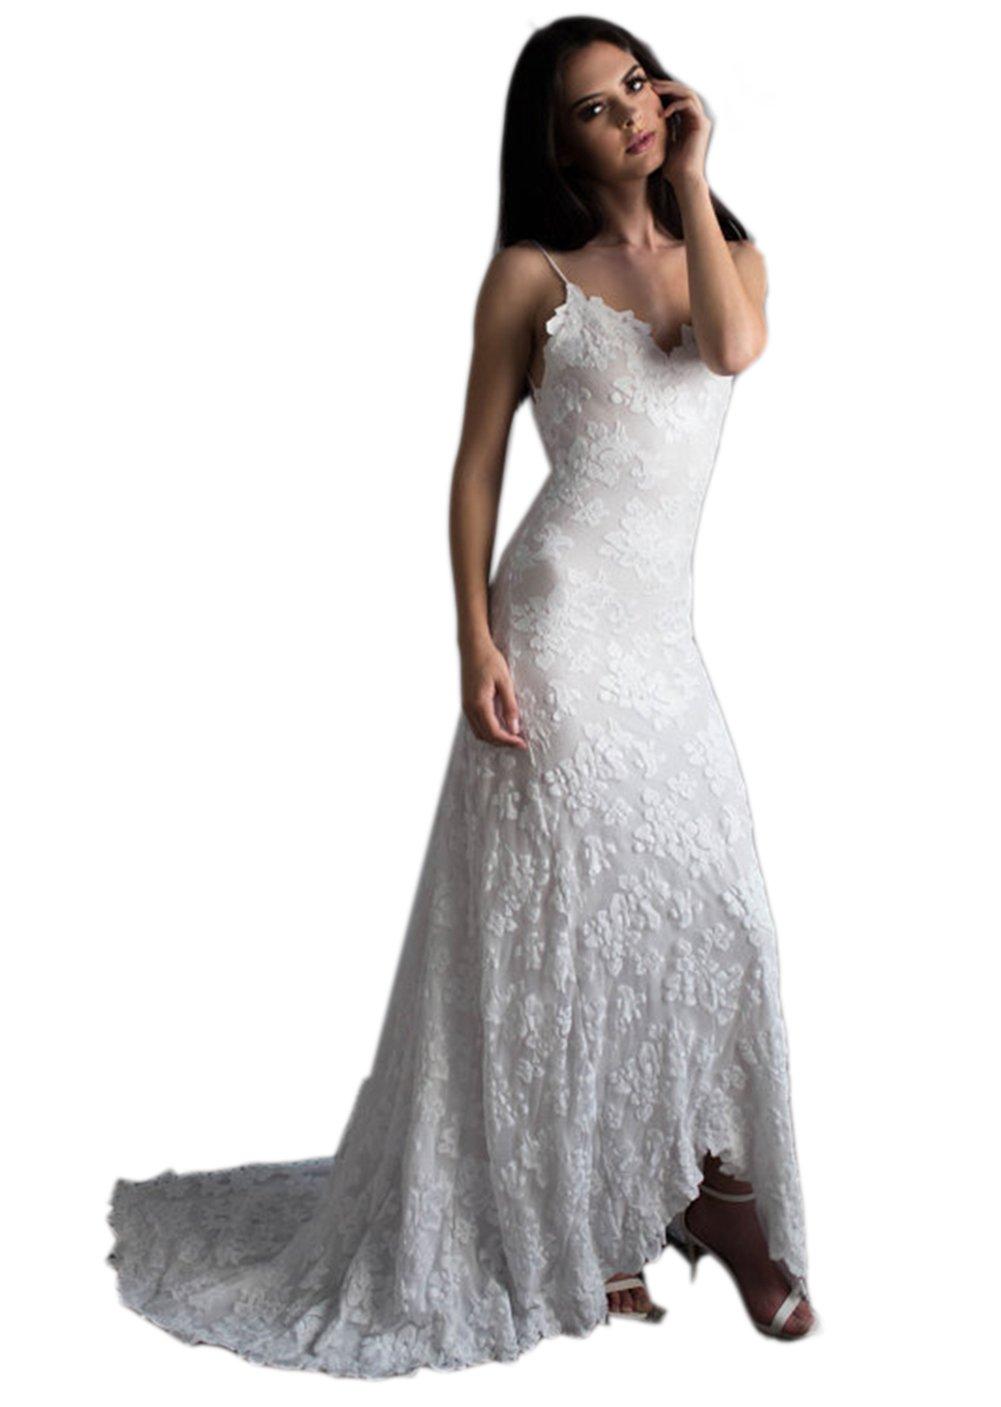 Mordarli Women's Spaghetti Straps Lace V-neck Backless Beach Wedding Dress